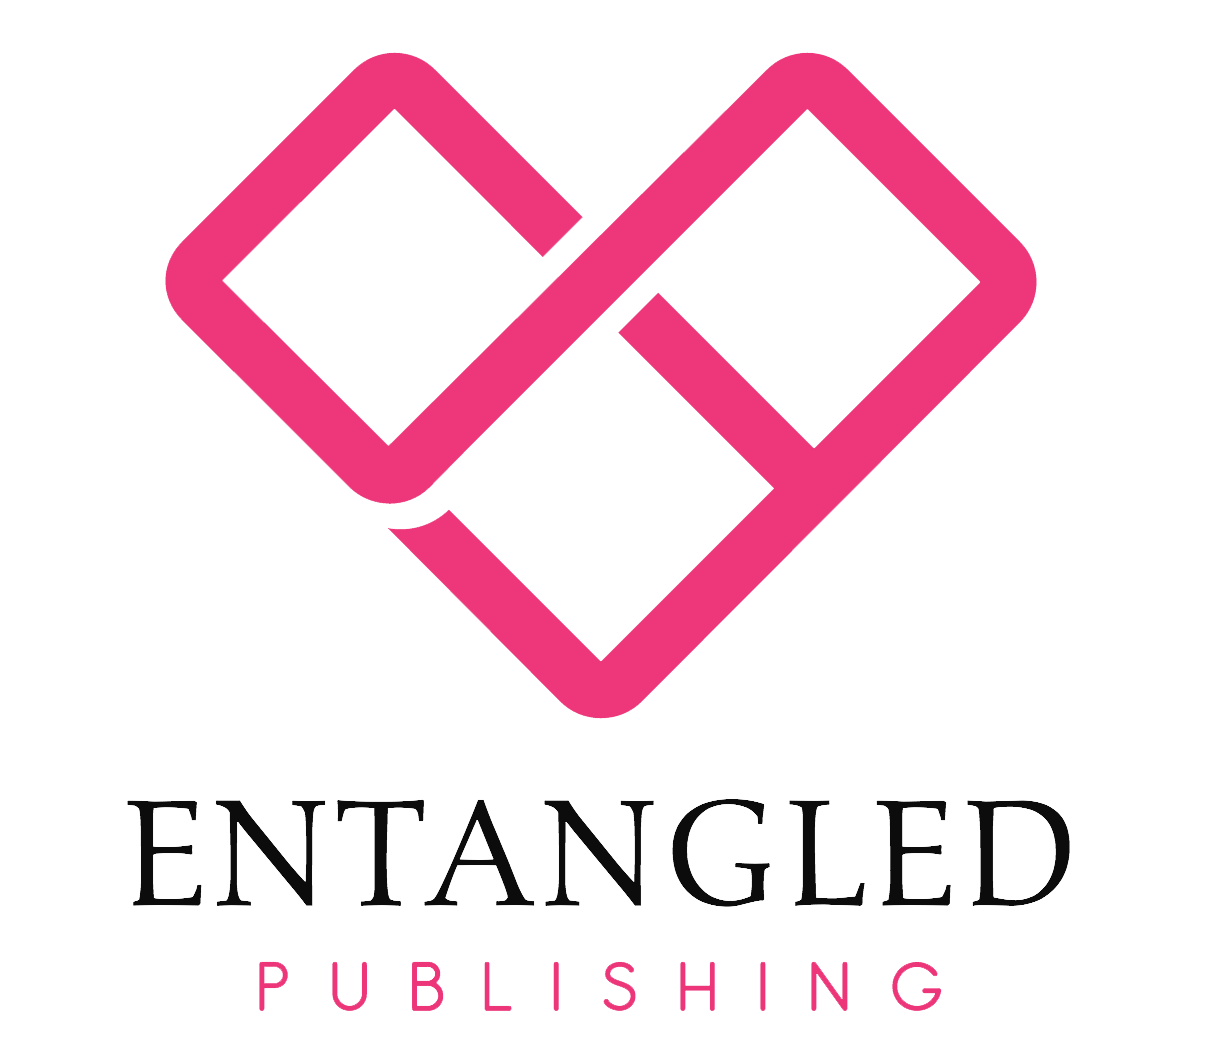 entangled-publishing-new-imprint-august-1